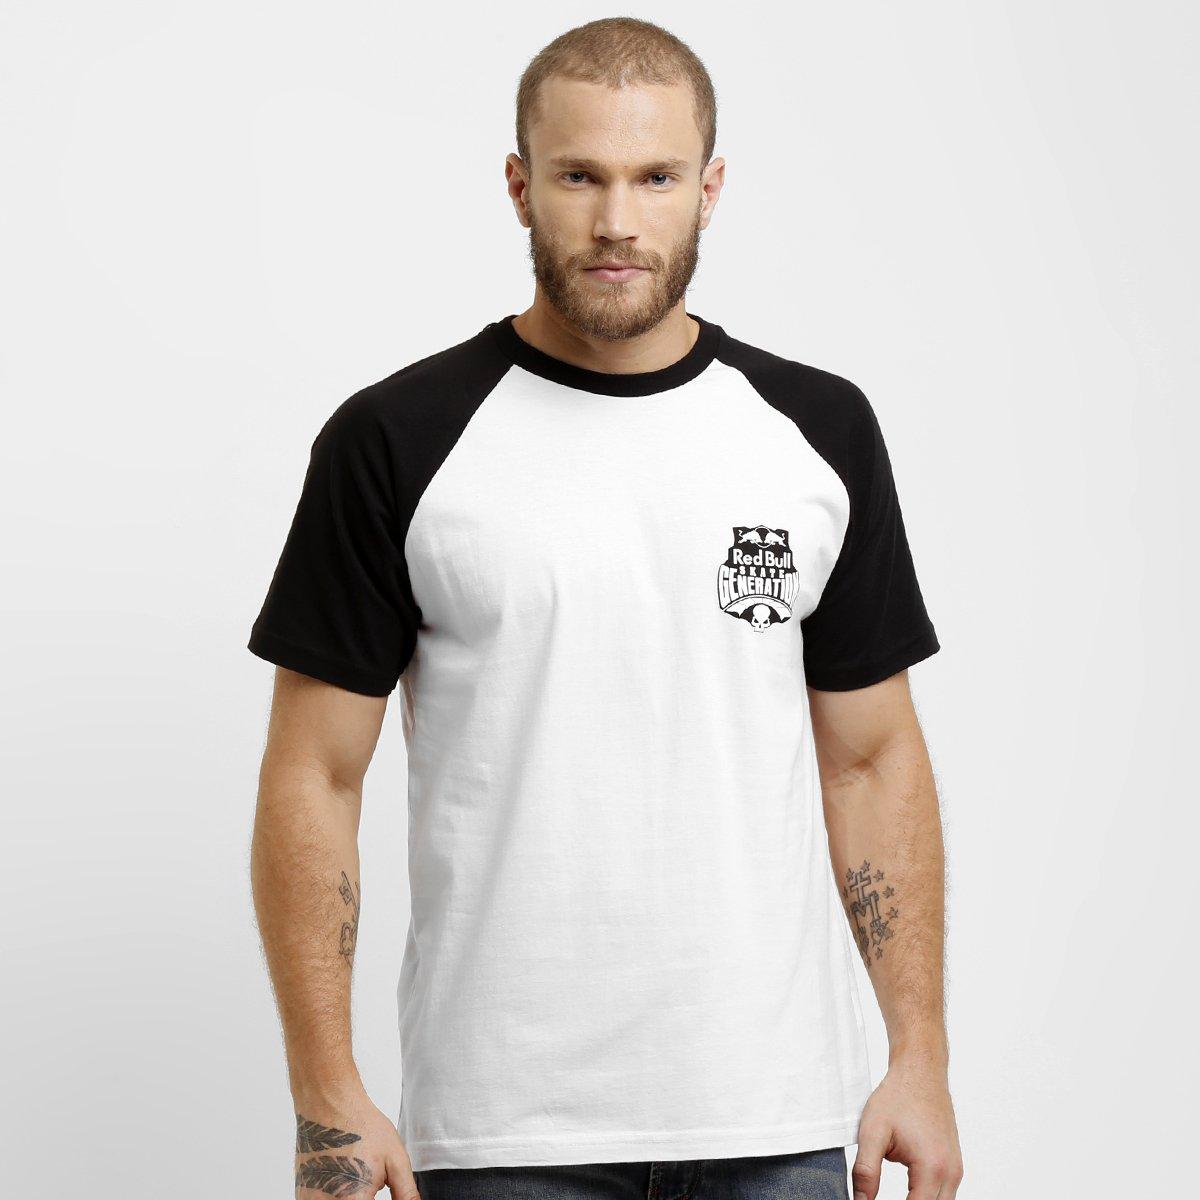 66fb58f611ab1 Camiseta Red Bull Raglan - Compre Agora